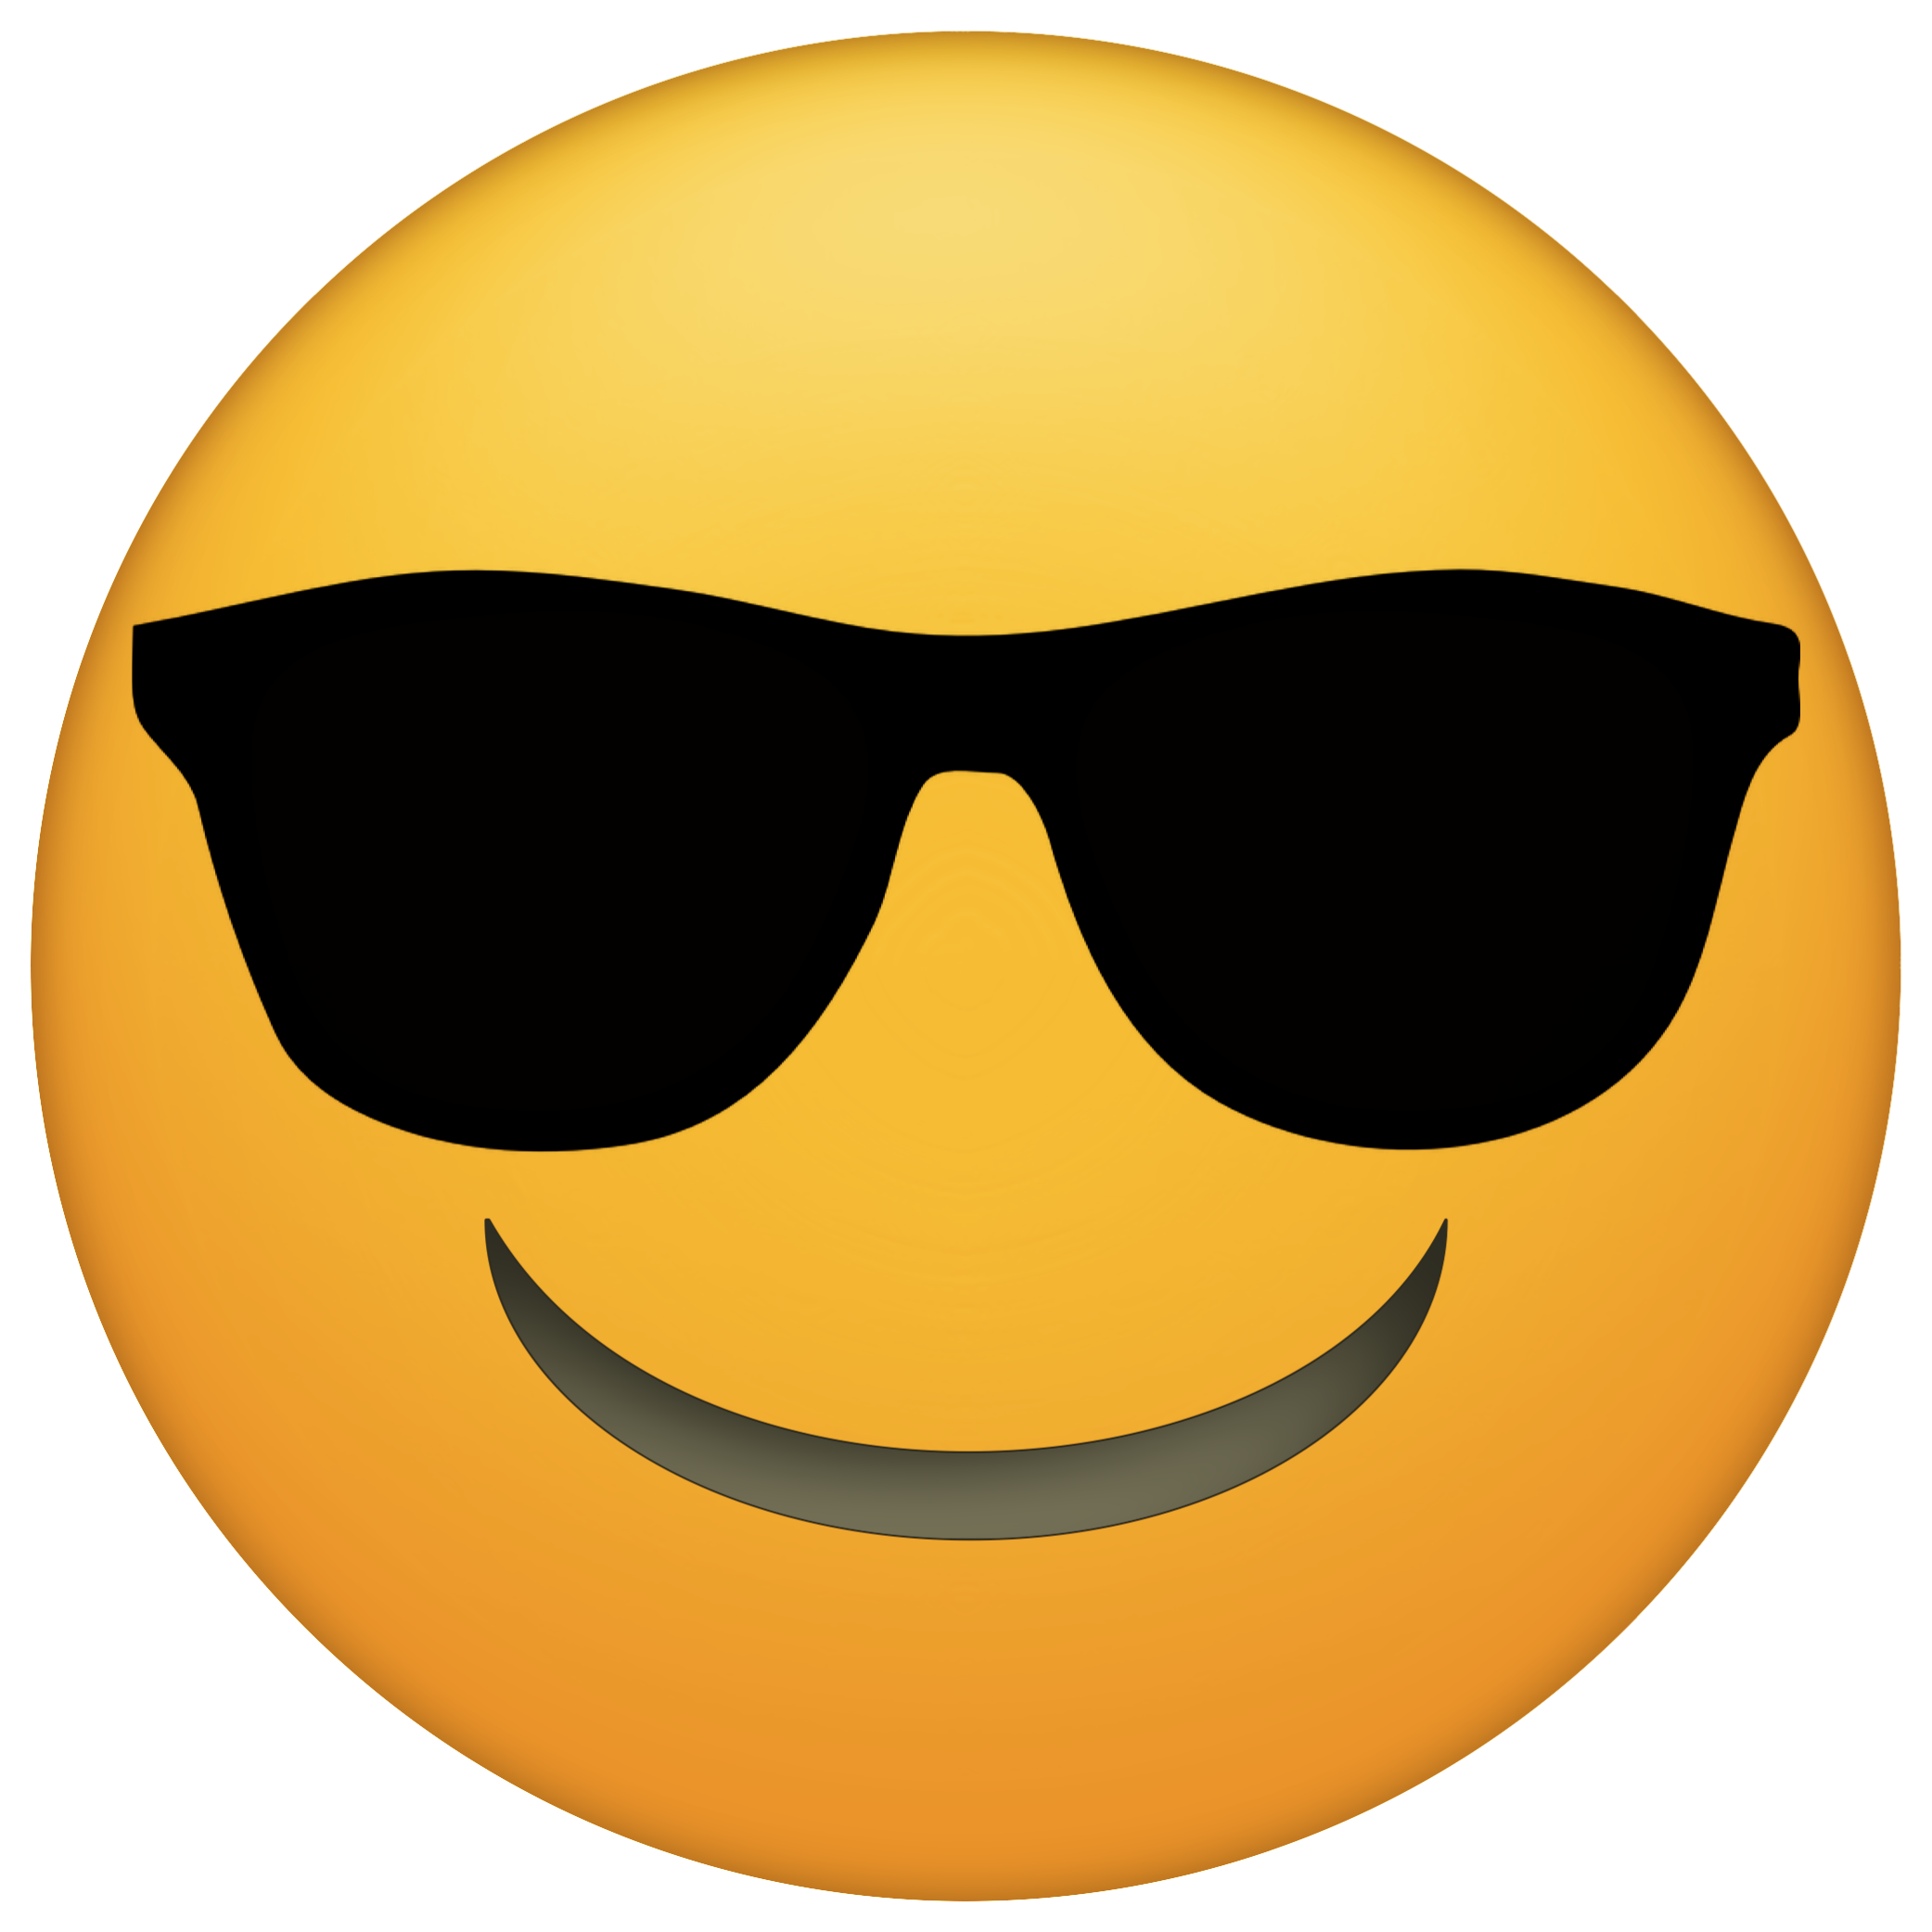 jpg royalty free Vector emojis sunglasses. Www papertraildesign com wp